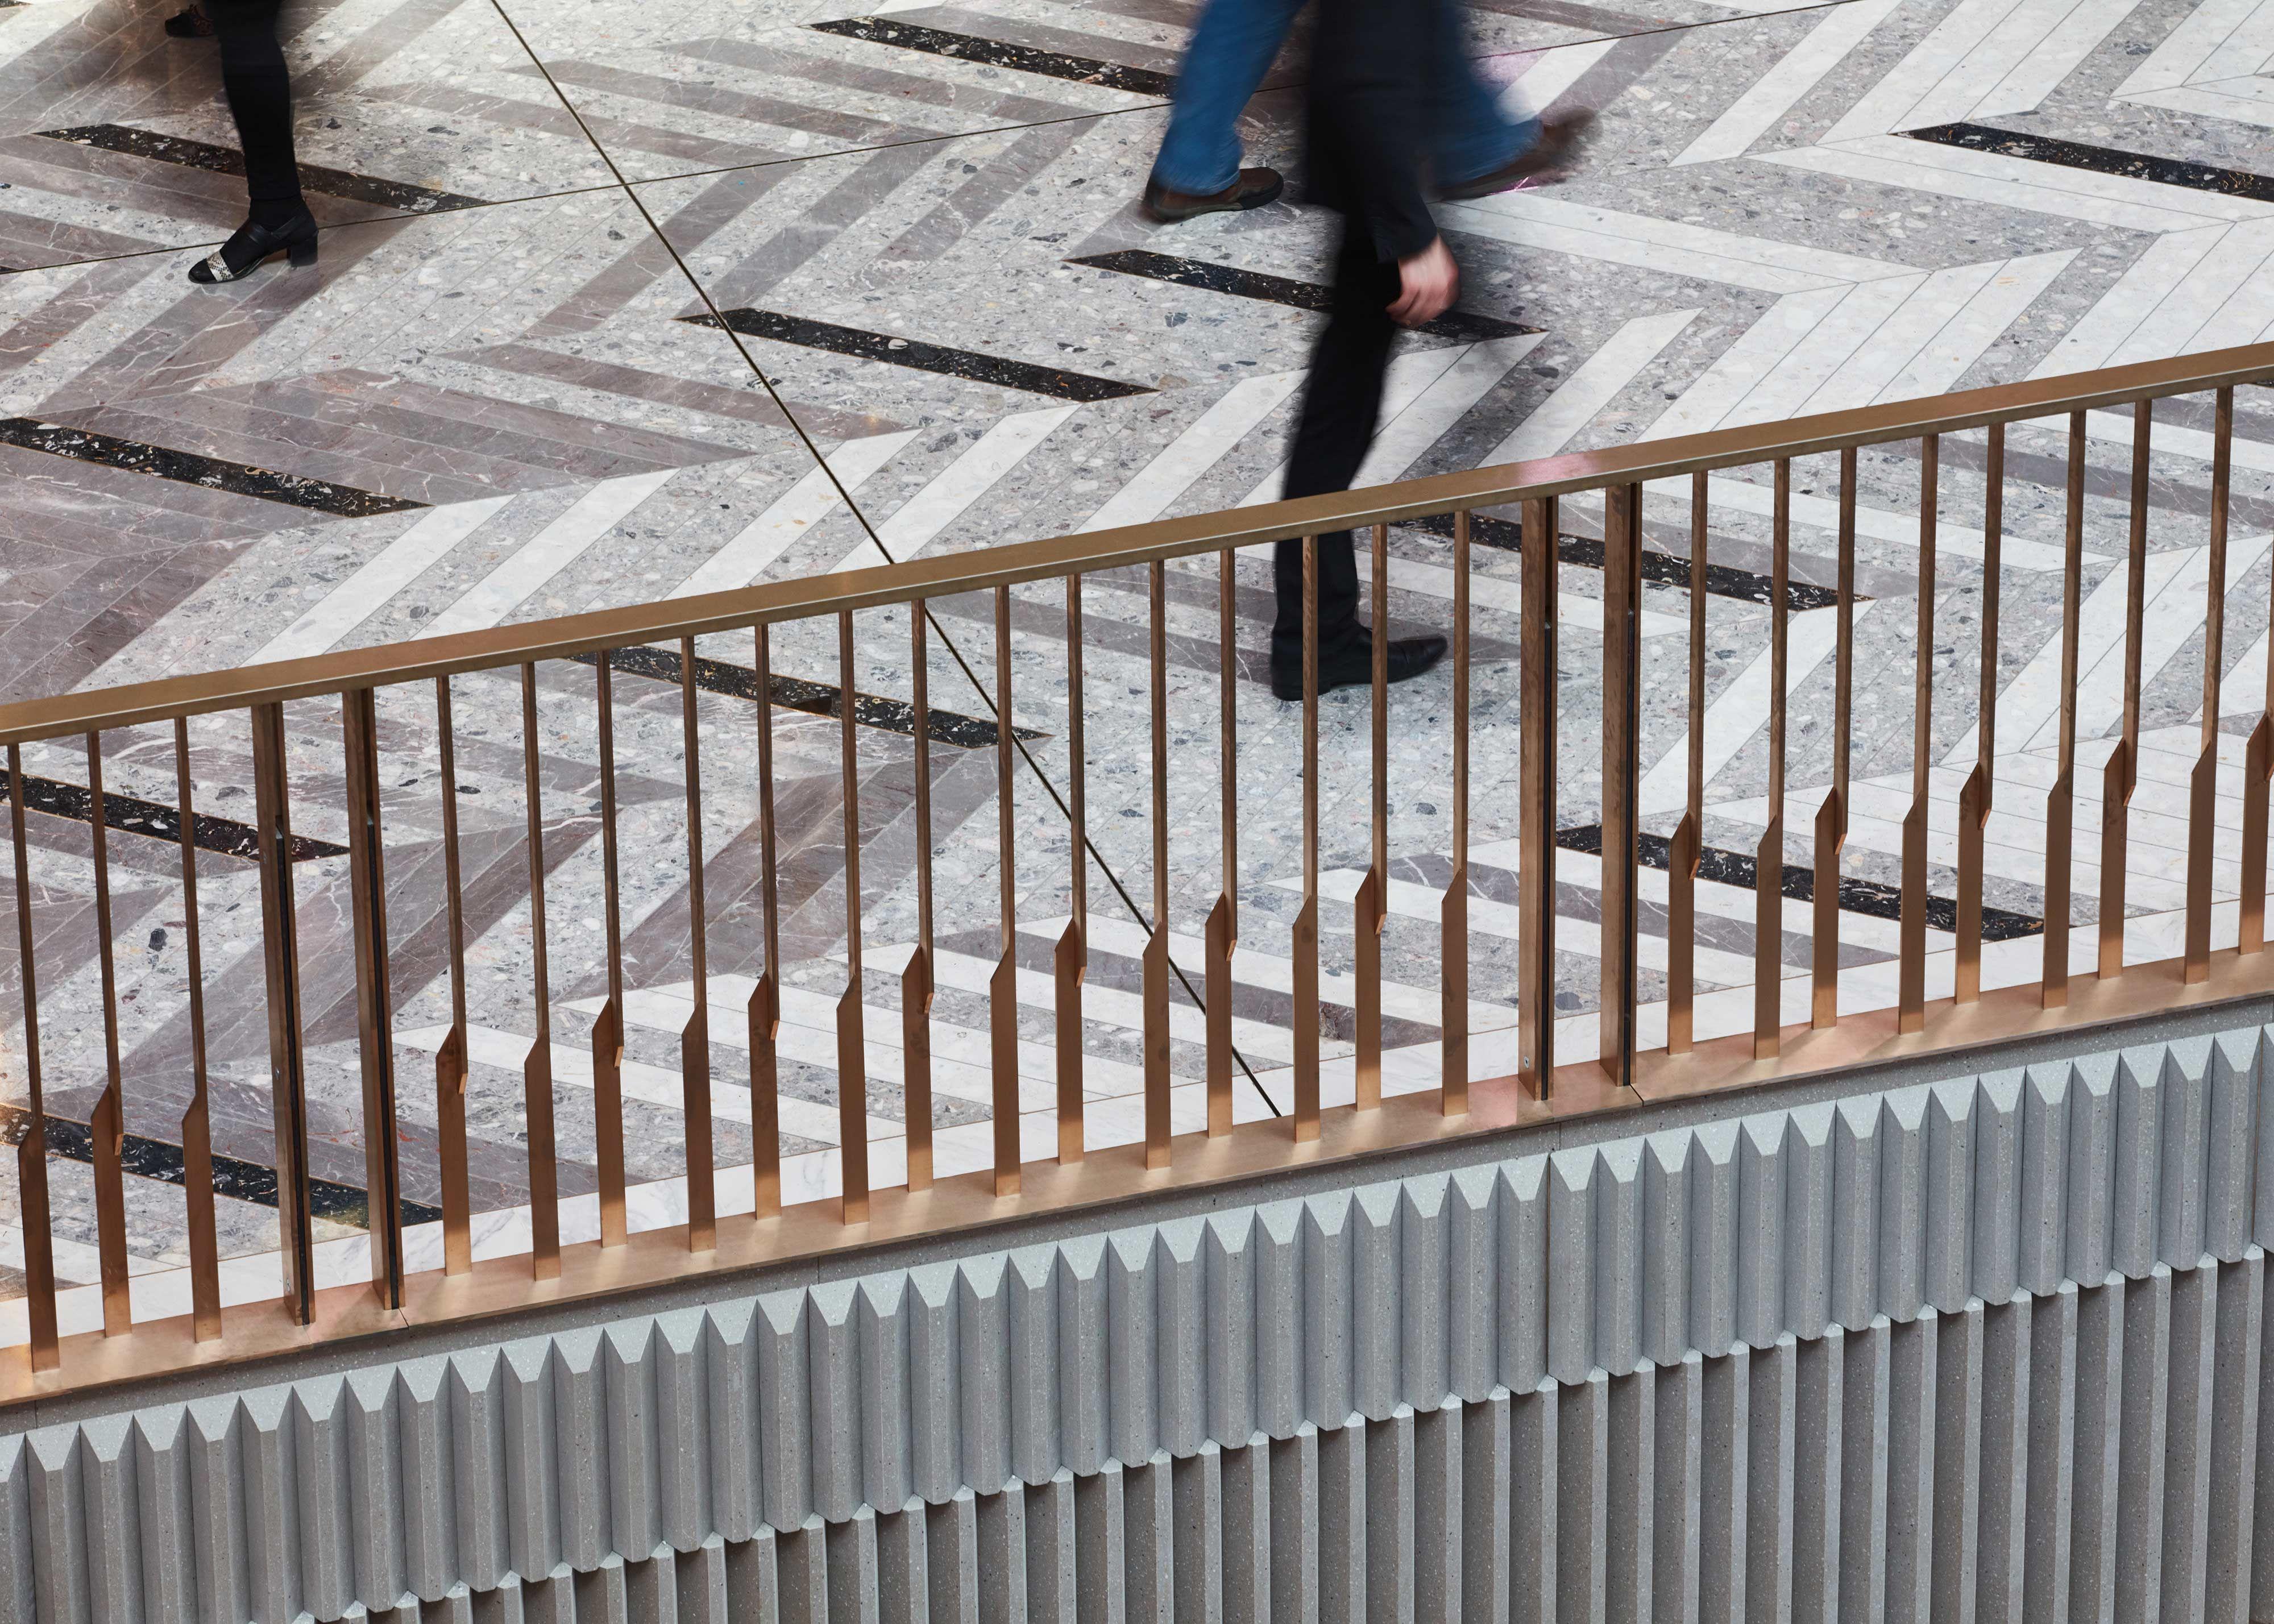 Handrail Design, Universal Design